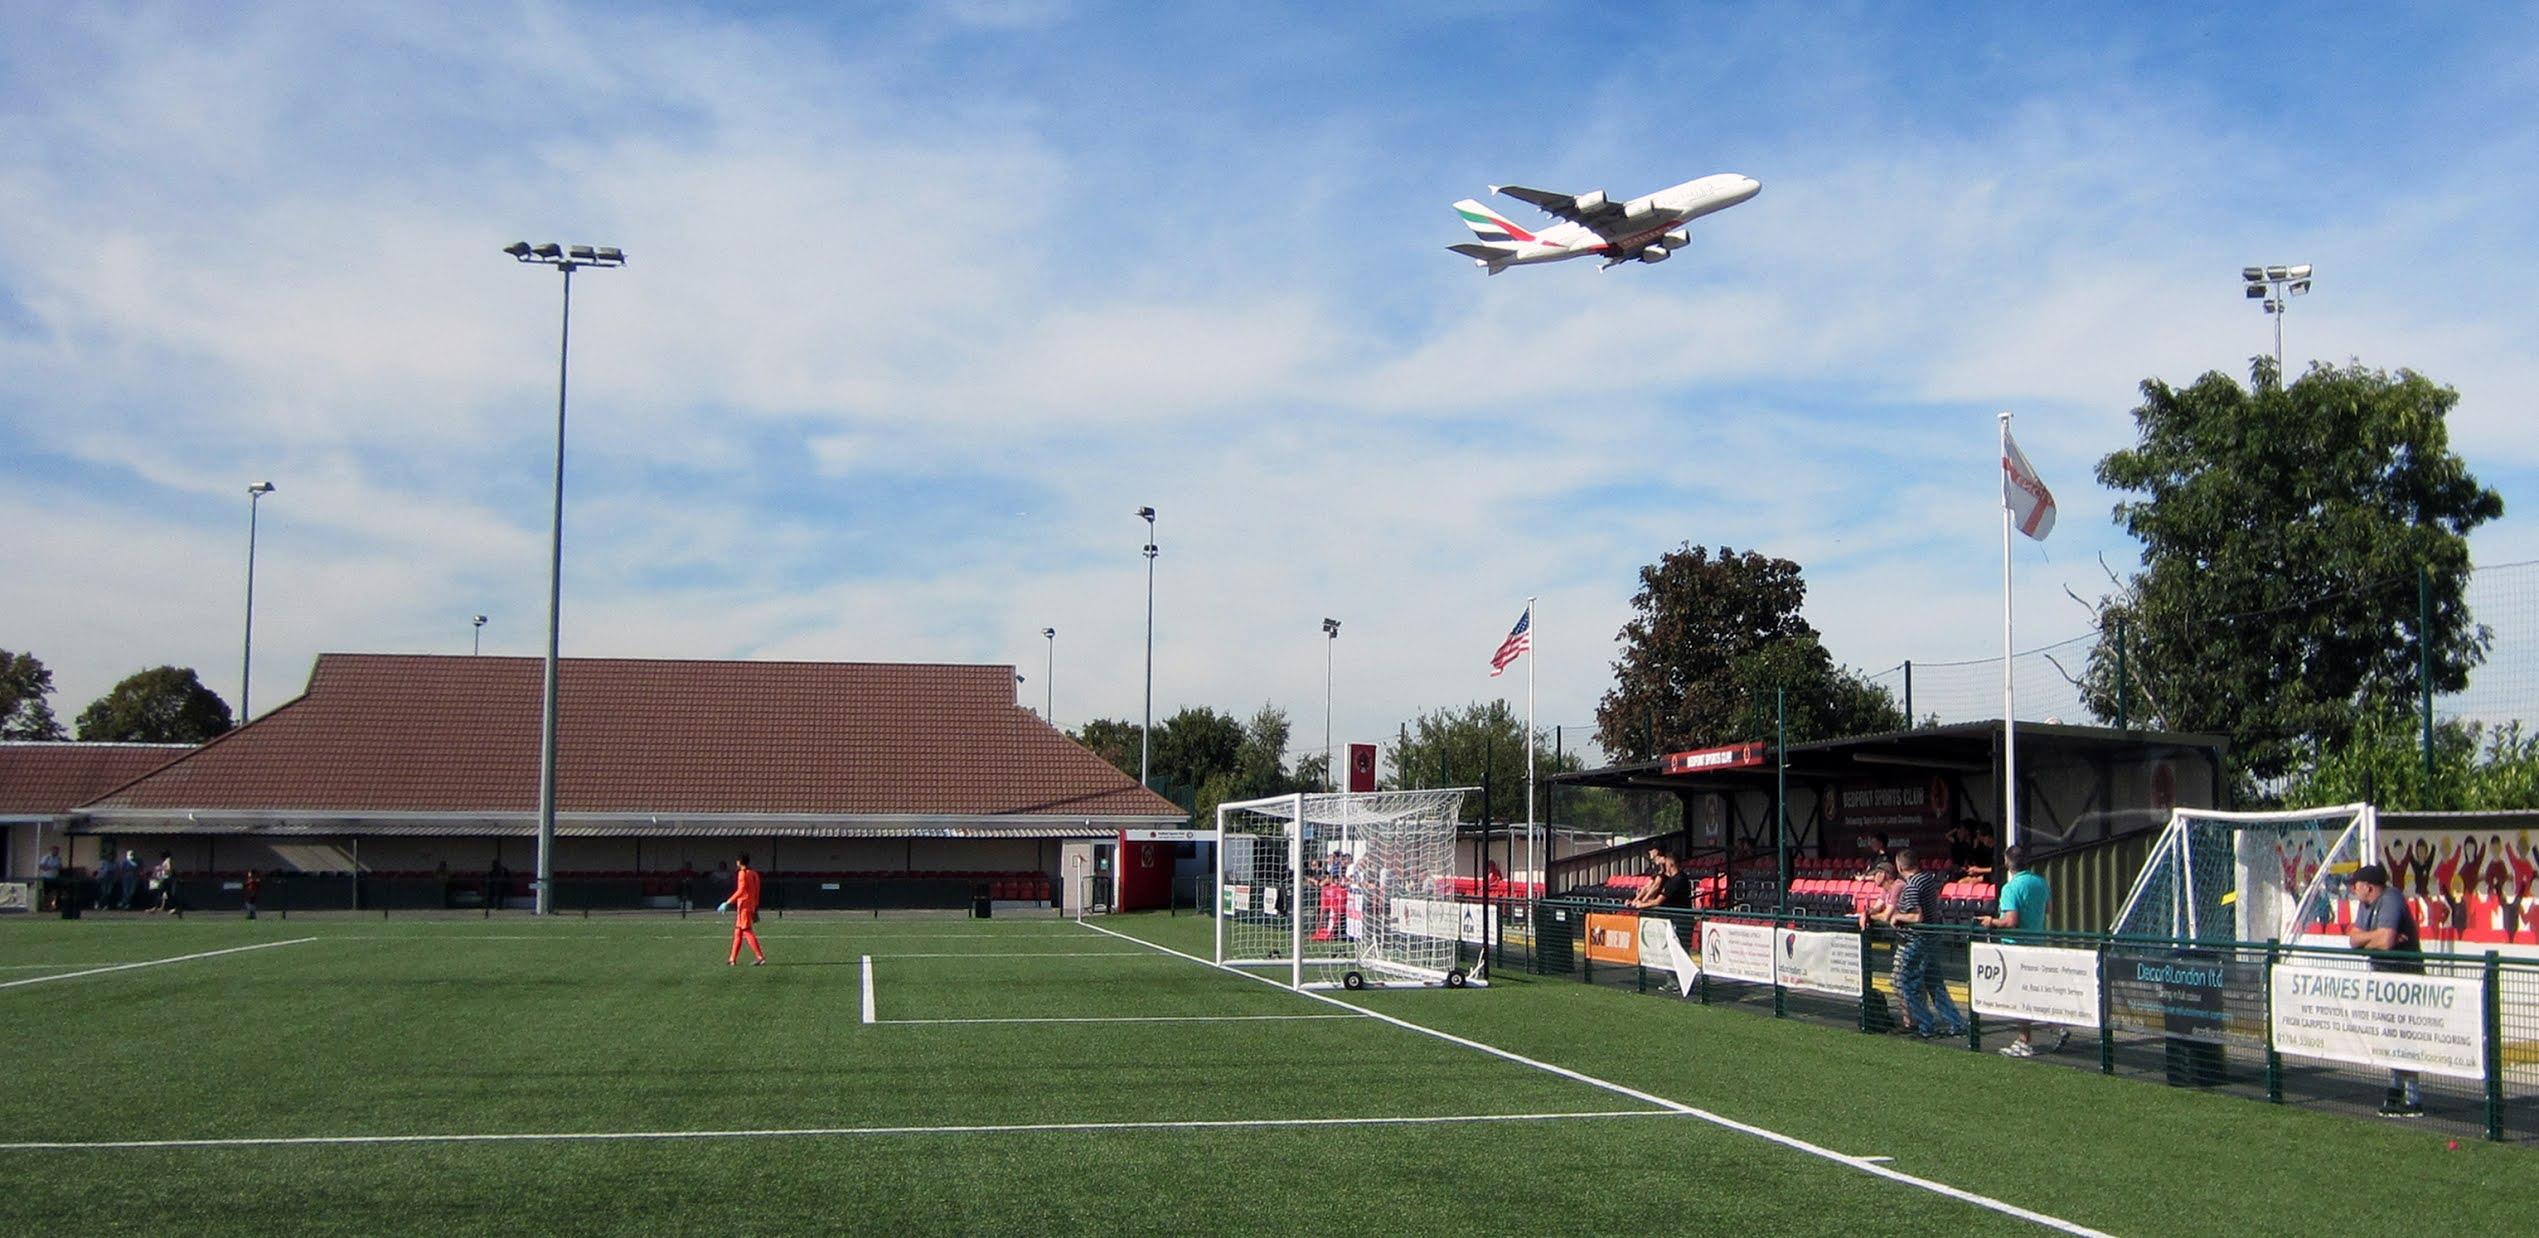 A British Airways flight takes off over Bedfont Sports Recreation Ground